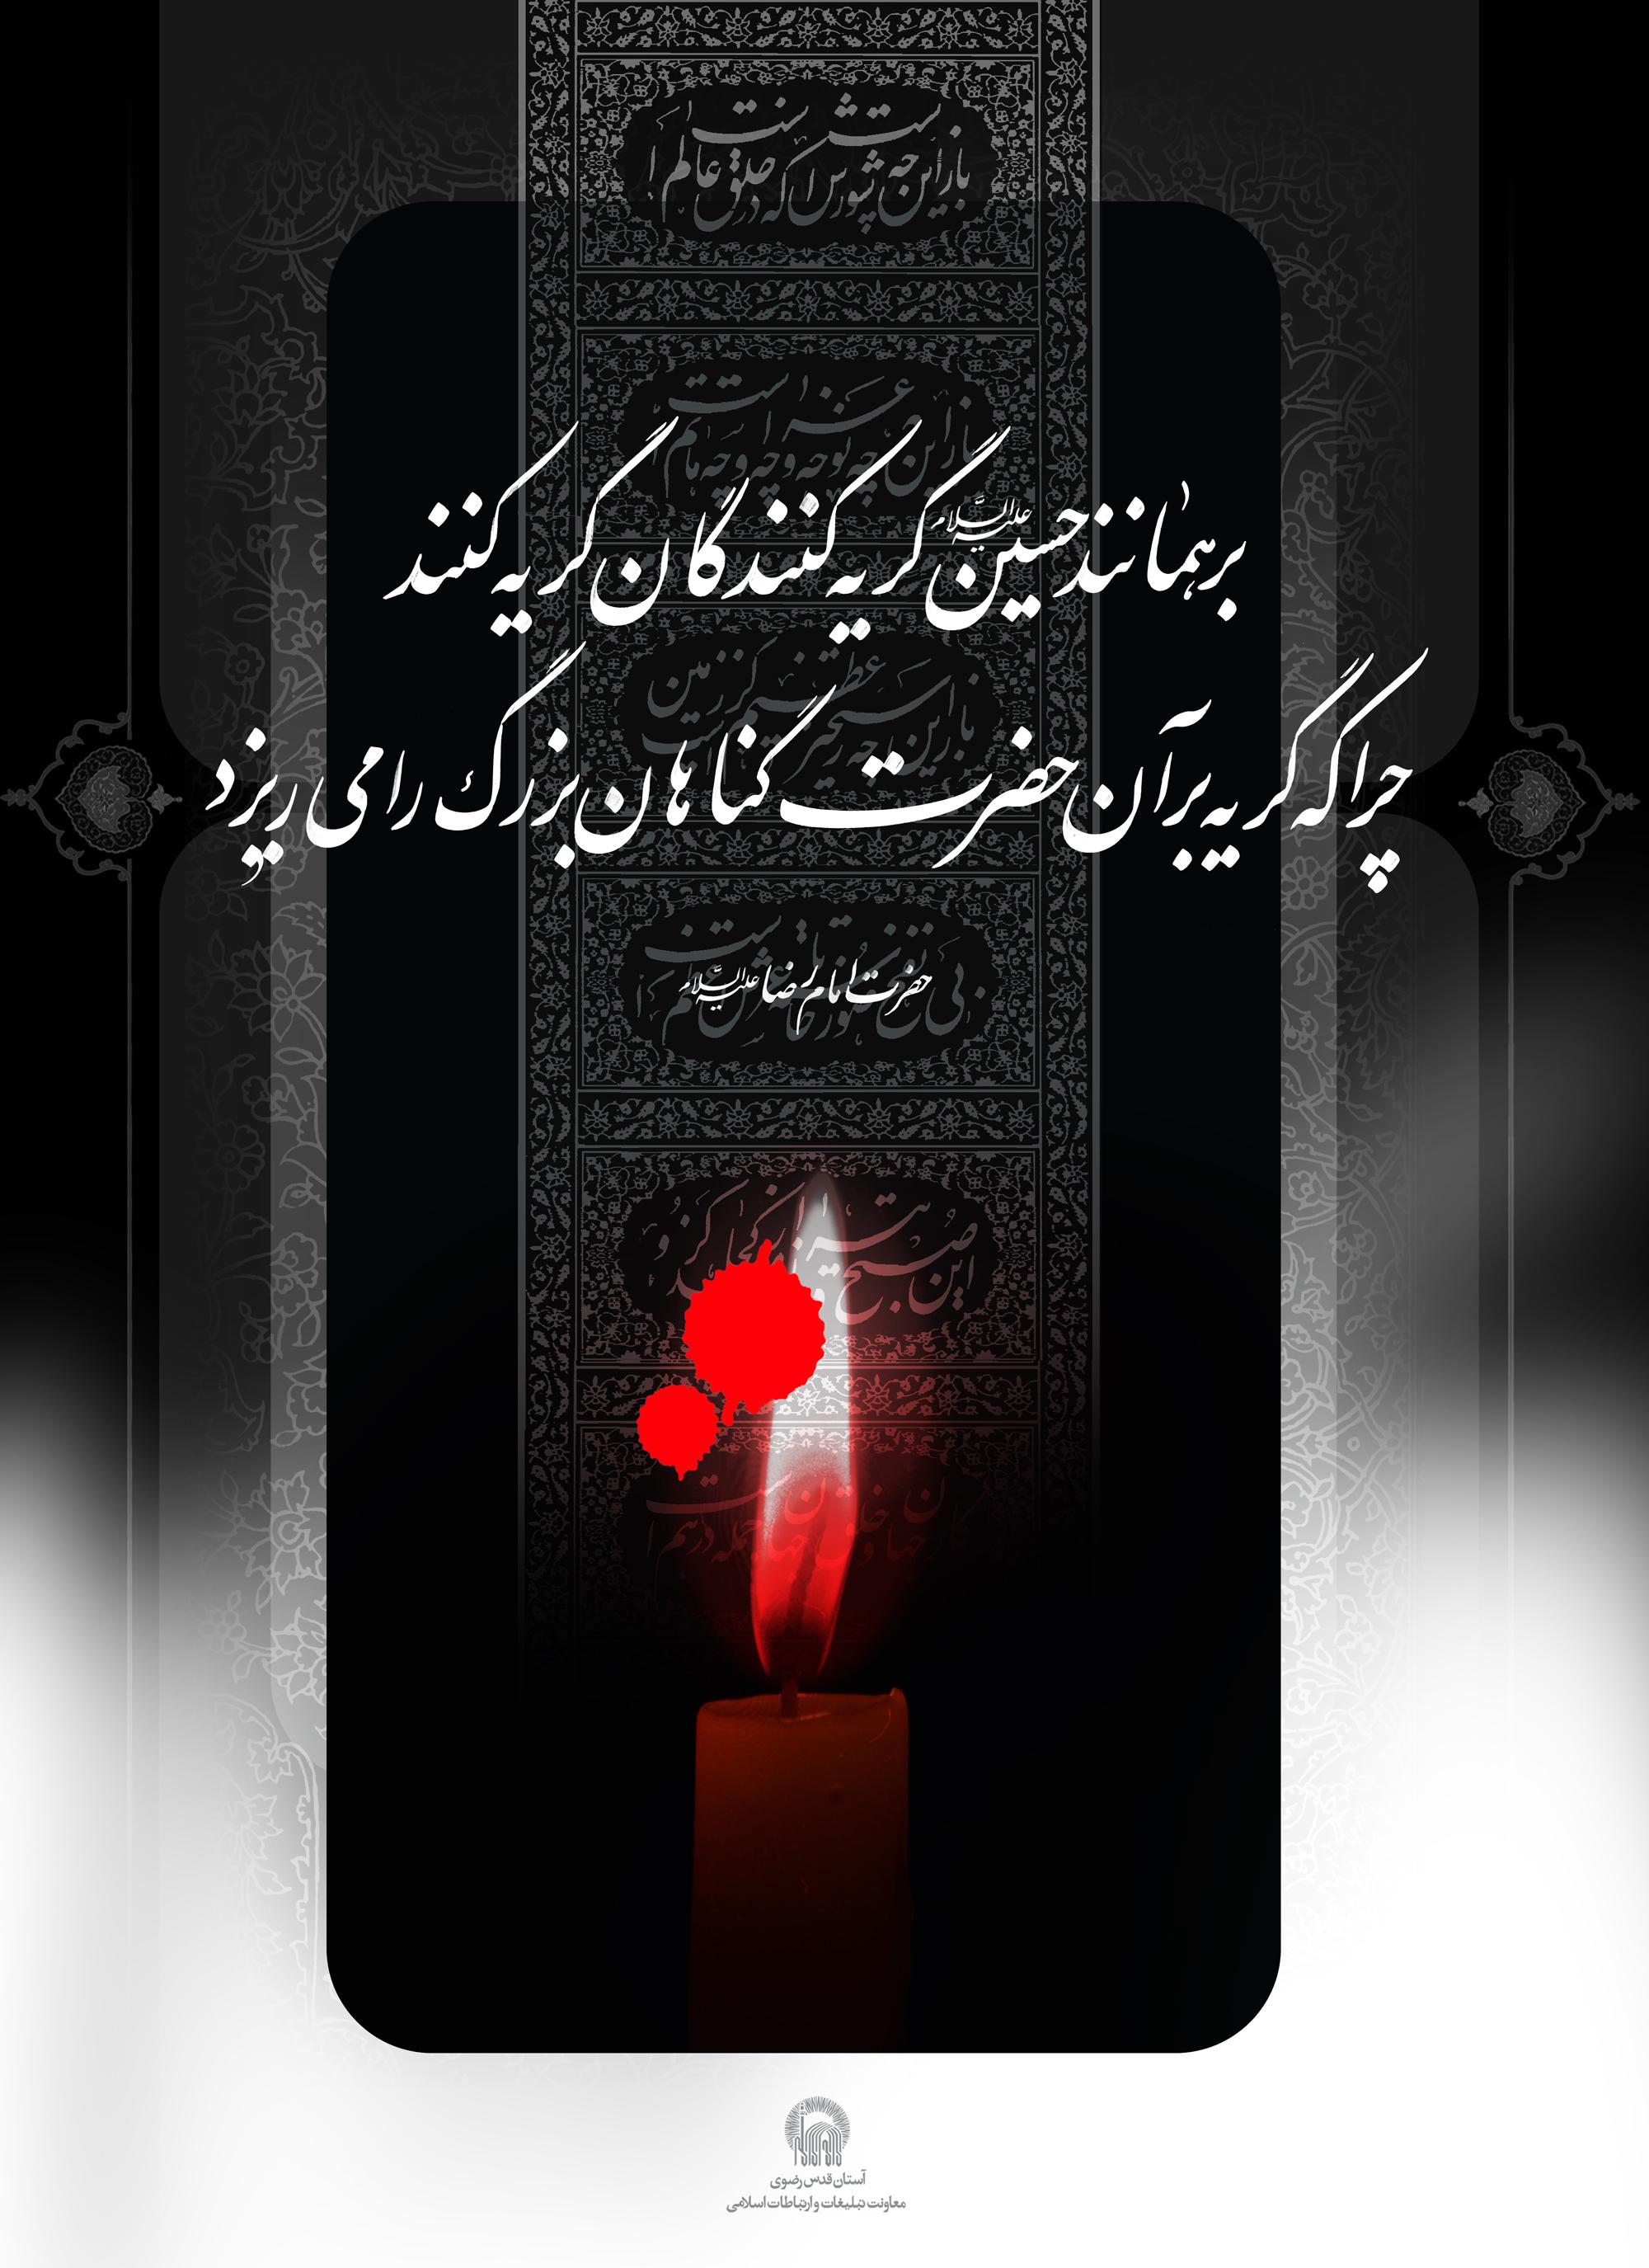 ۰۱۴_ImamHussein_www.IslamicWallpaper